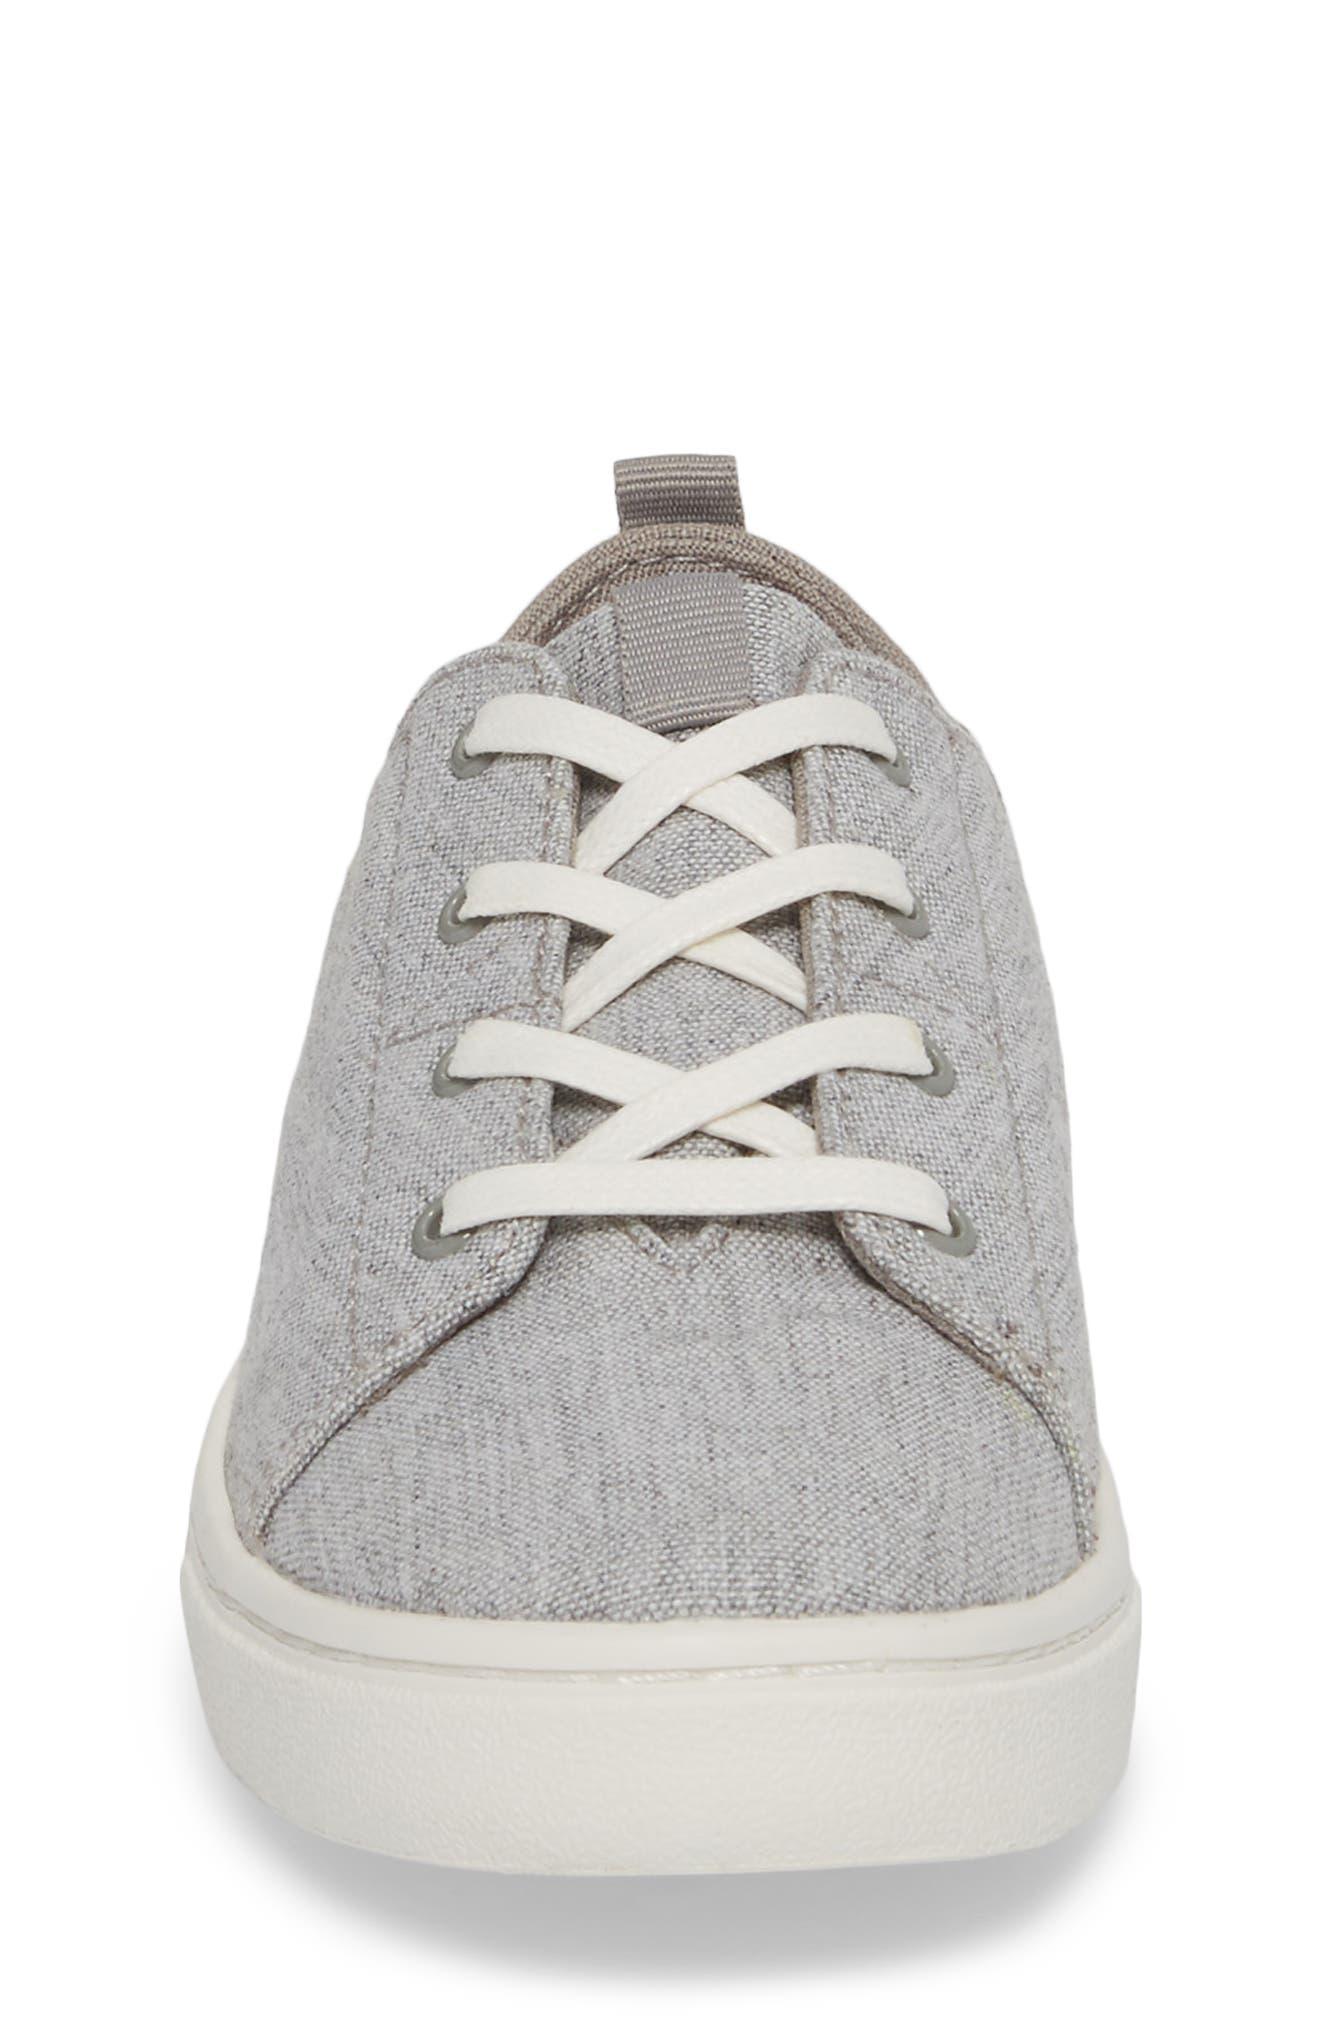 Lenny Sneaker,                             Alternate thumbnail 4, color,                             Drizzle Grey Slub Chambray